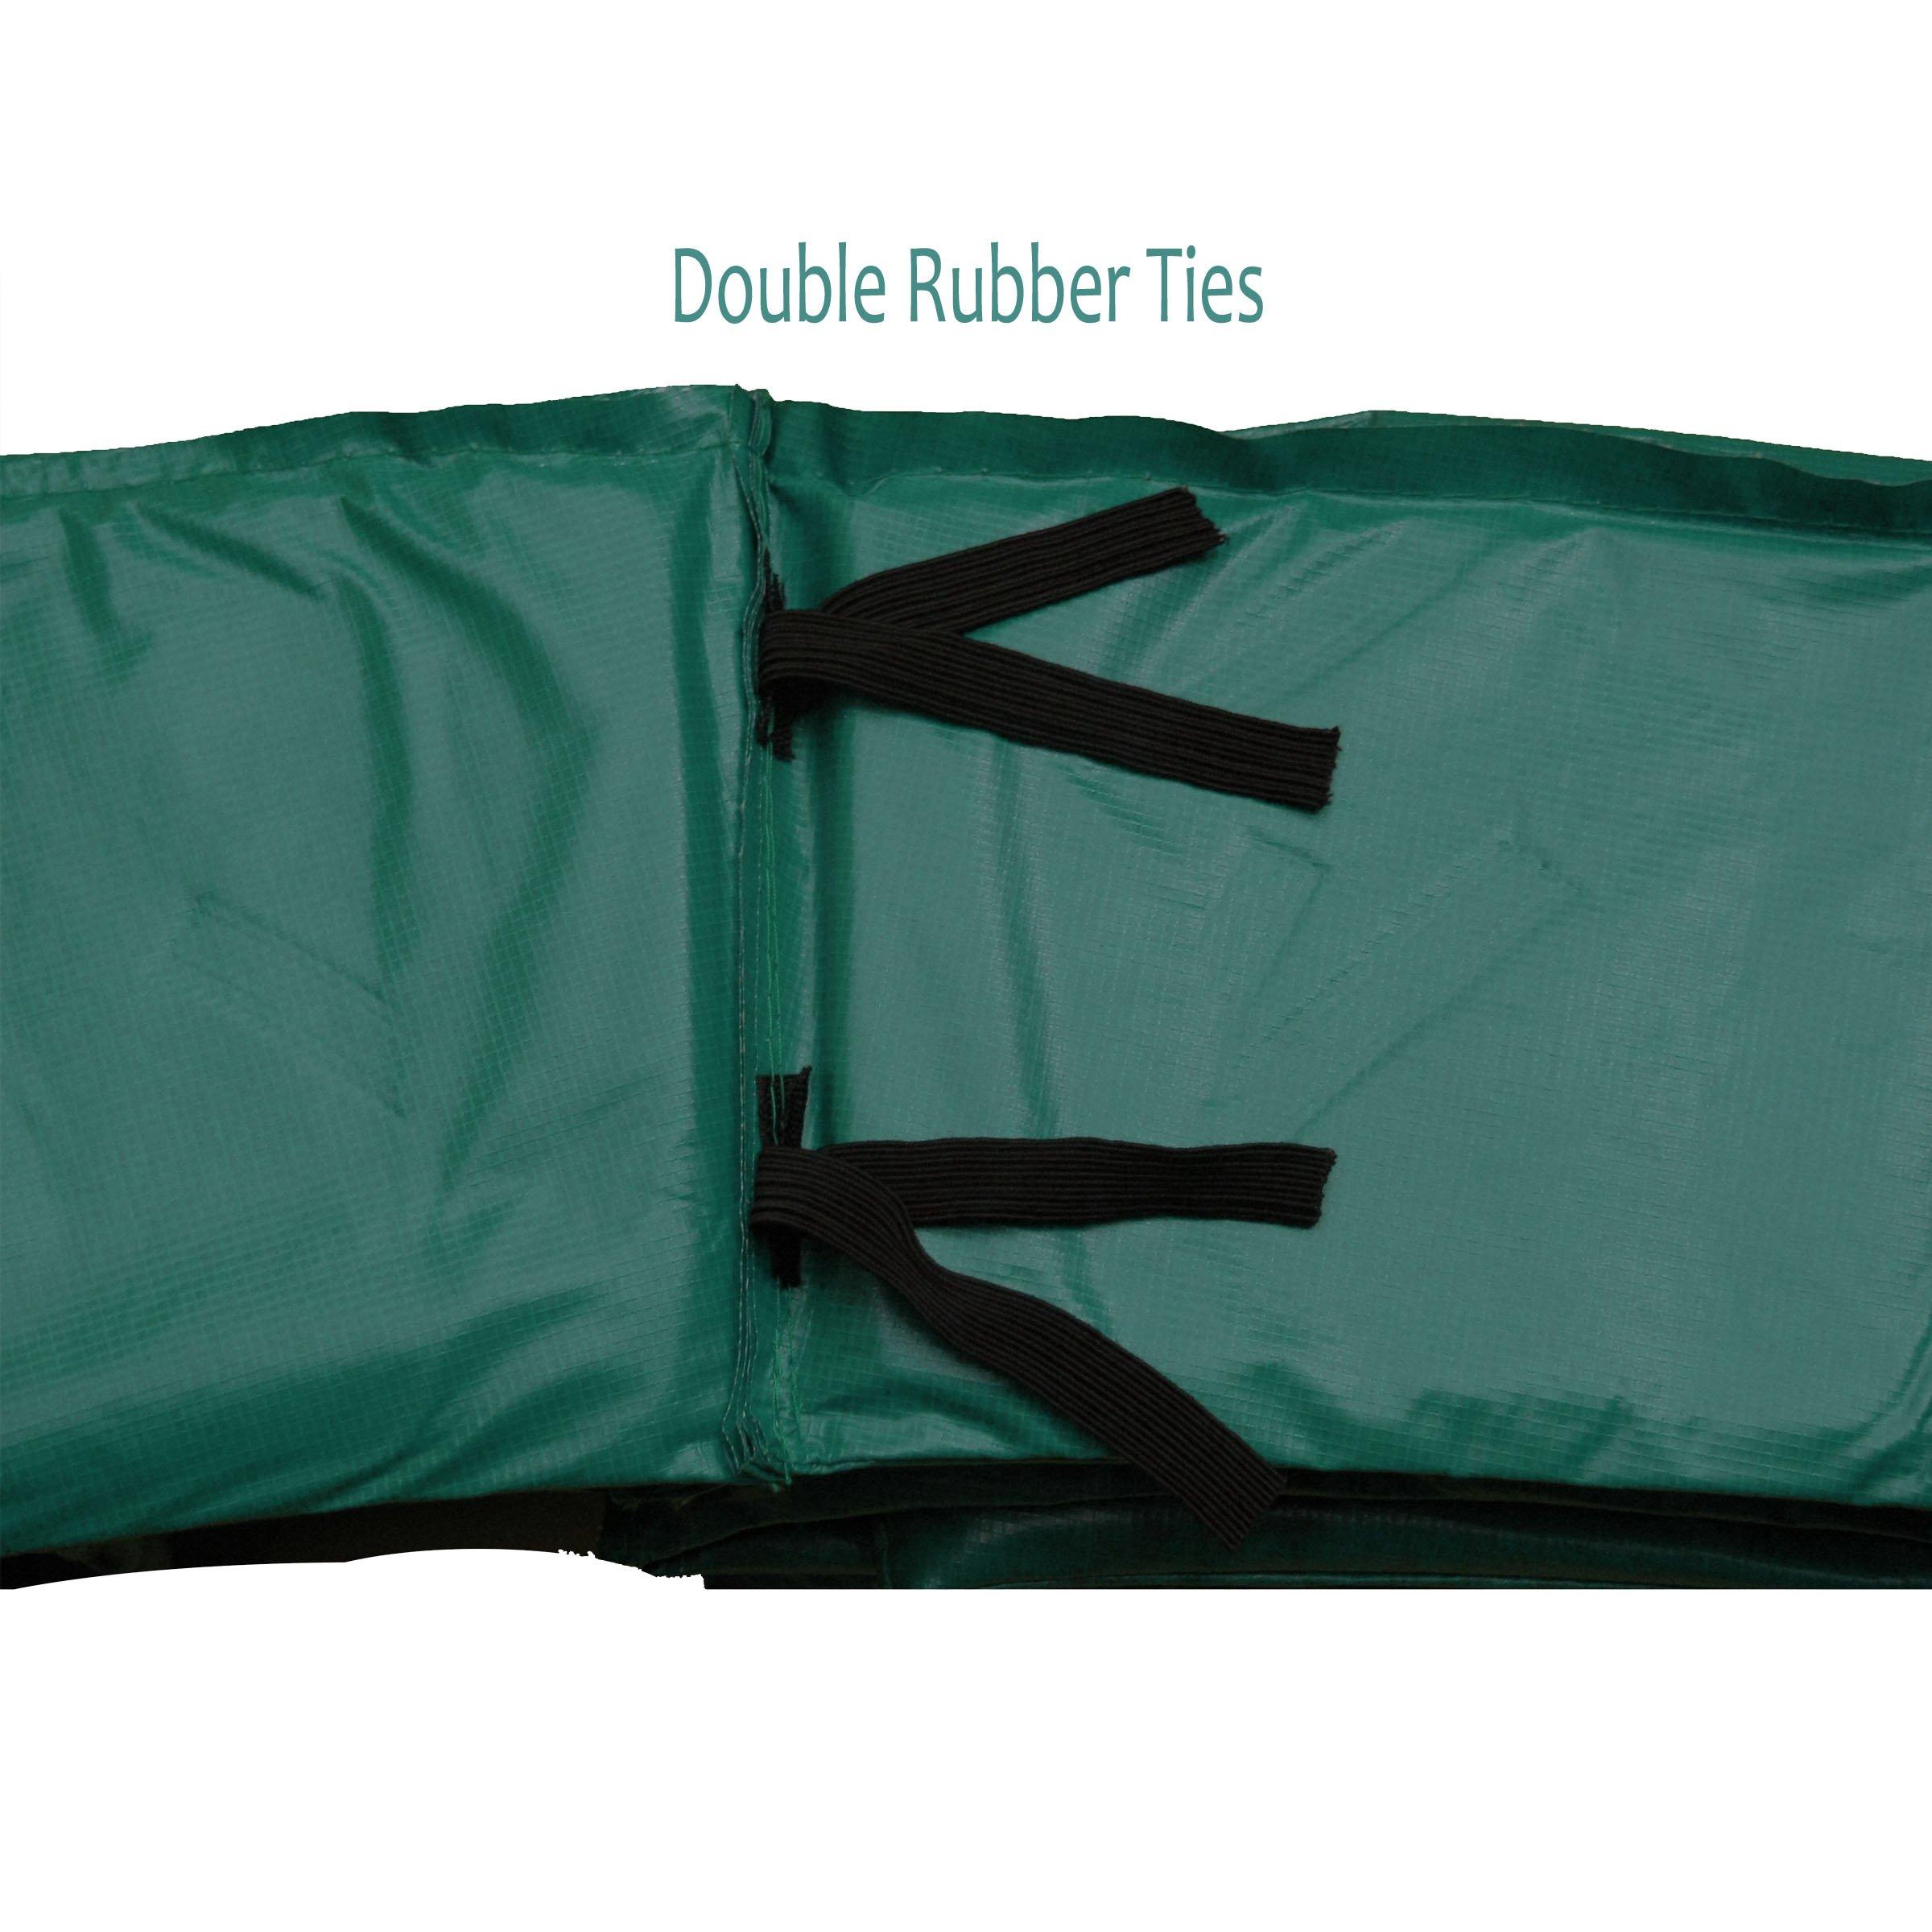 Upper Bounce Super Trampoline Jumping Mat & Green Pad Combo (Various Sizes)